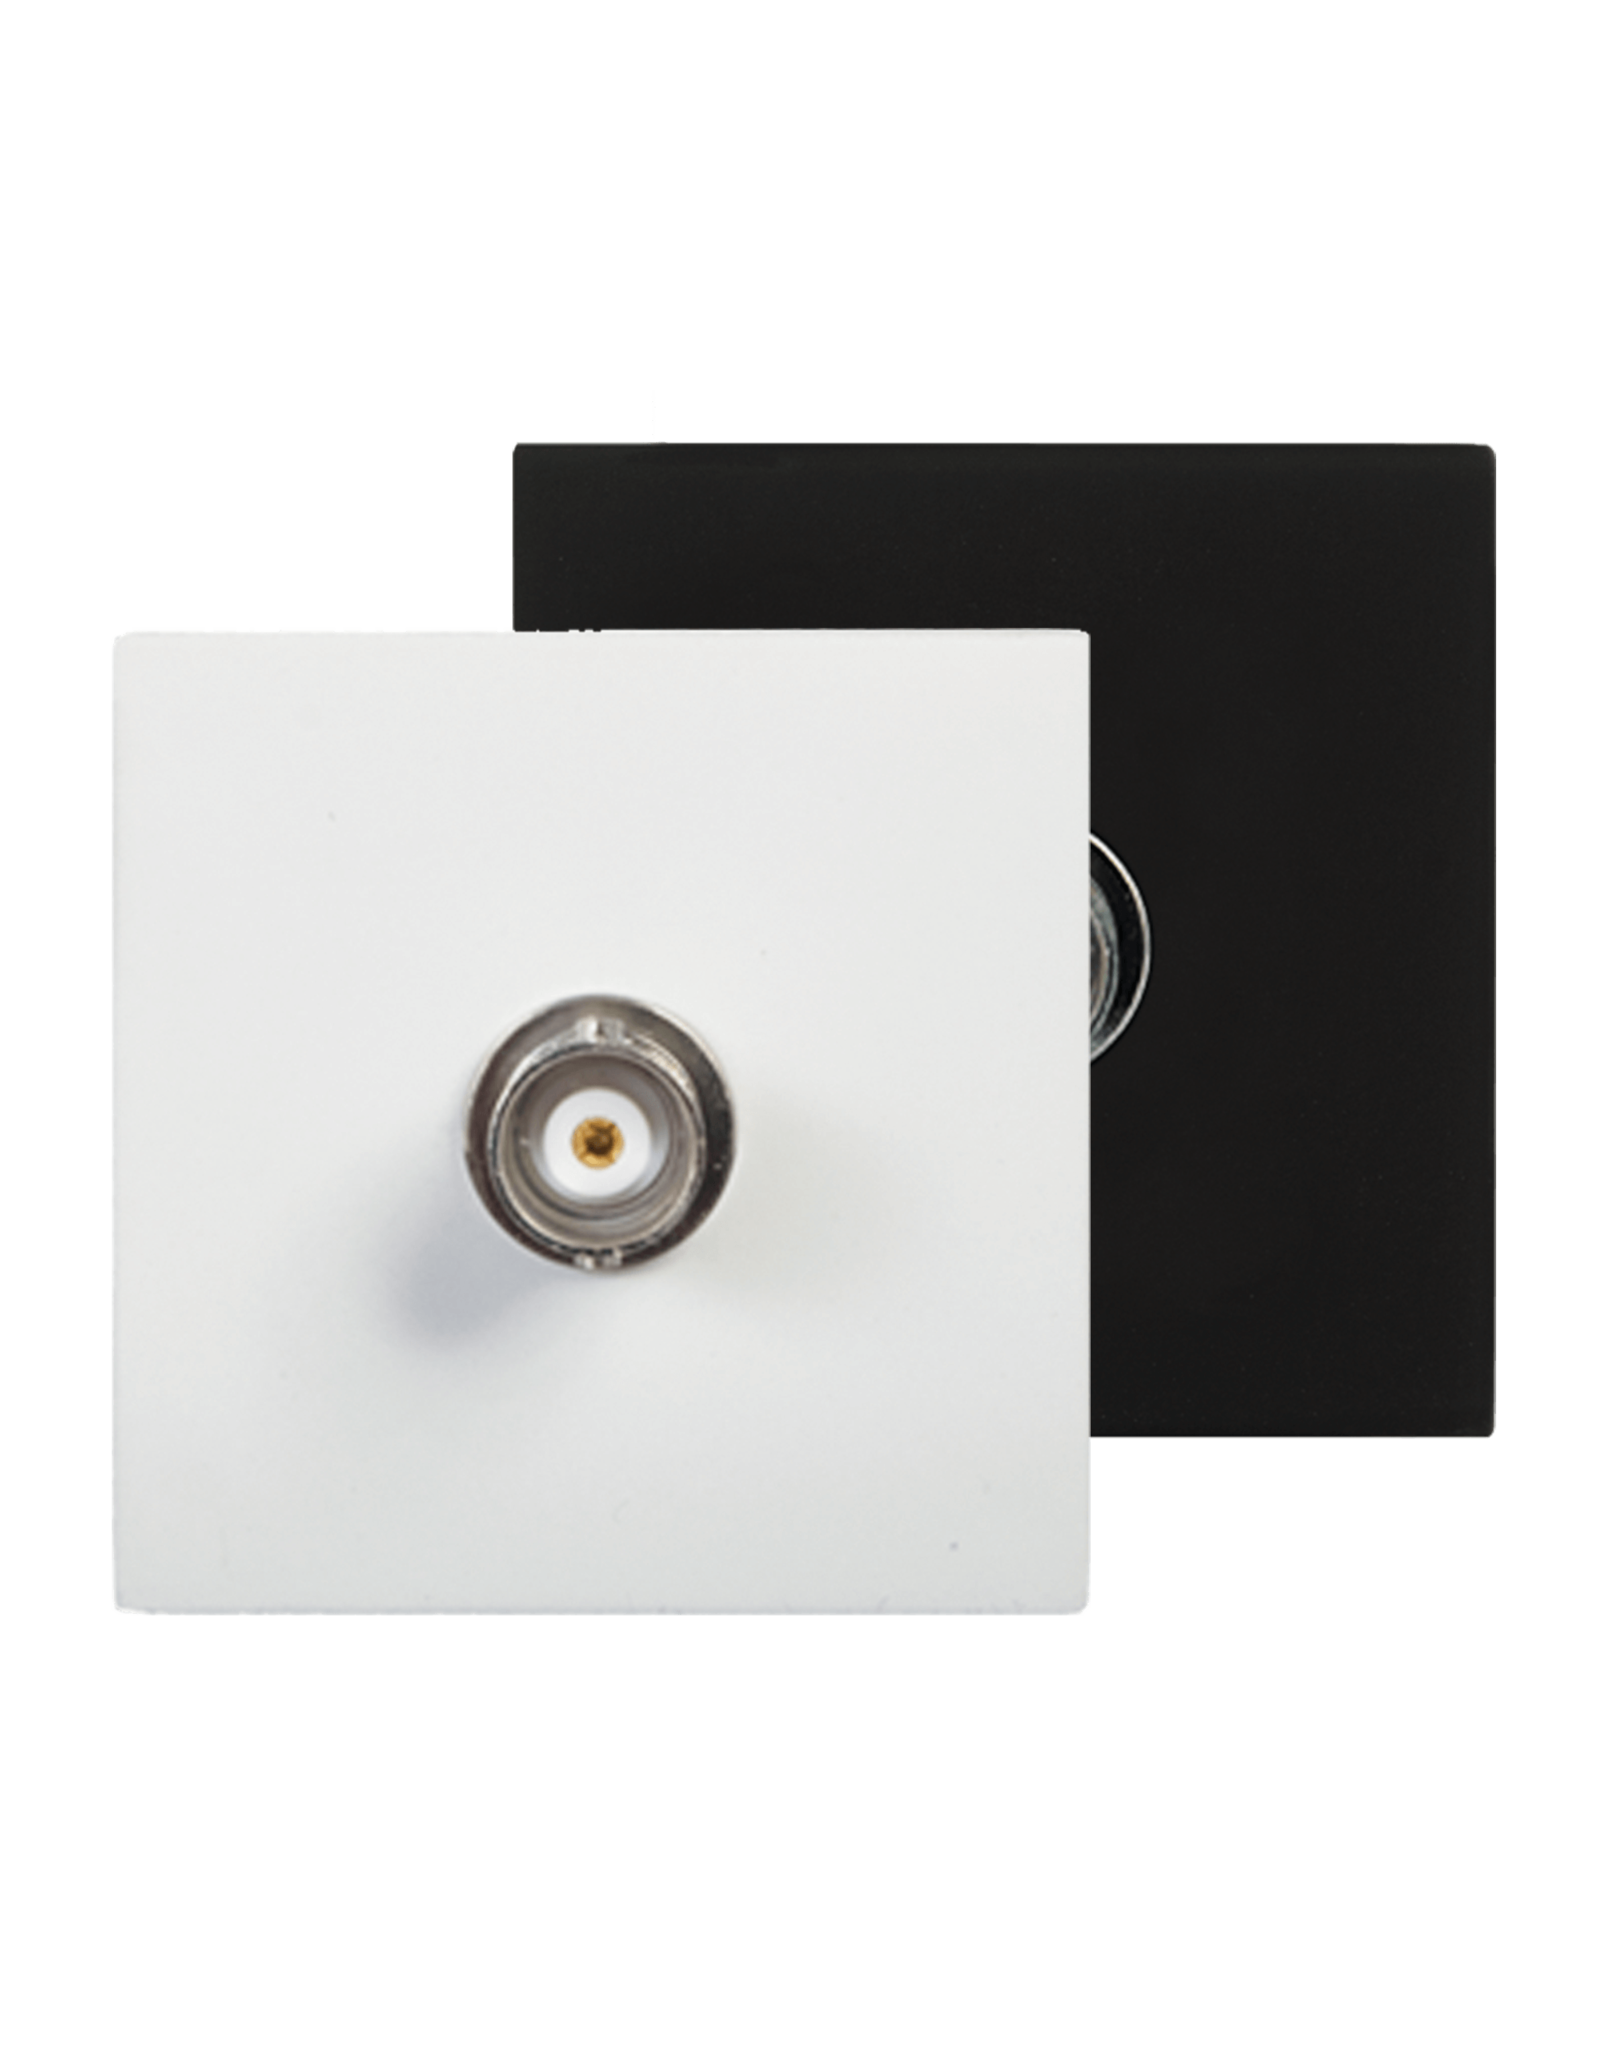 Audac Connection plate BNC 45 x 45 mm Black version